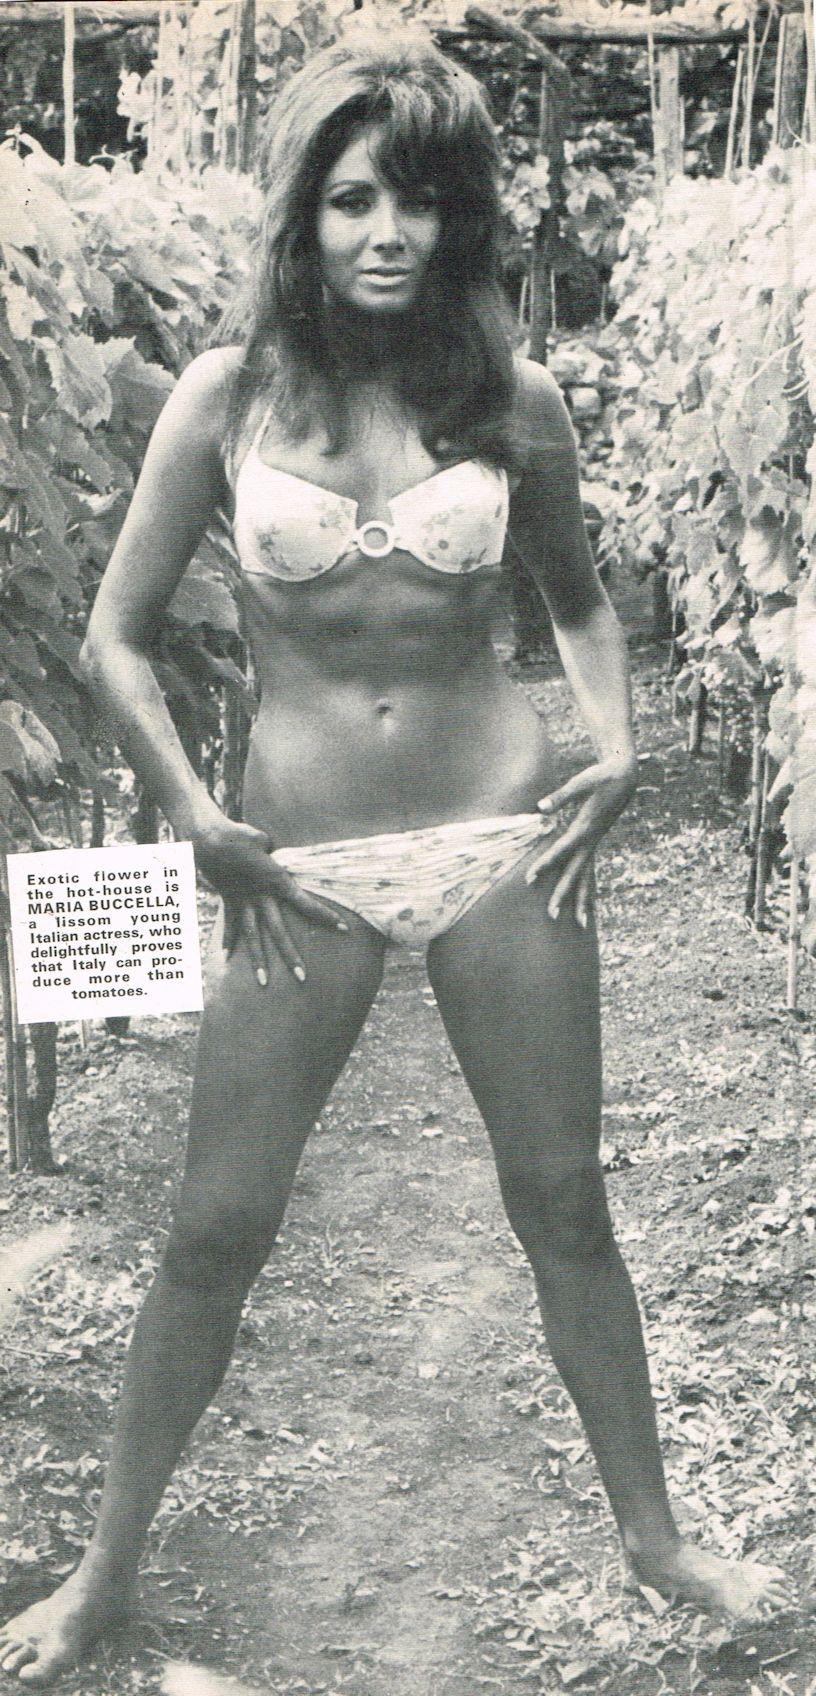 Manilyn Reynes (b. 1972),Miracle Laurie Hot video Basia Milewicz POL,V. Bozeman